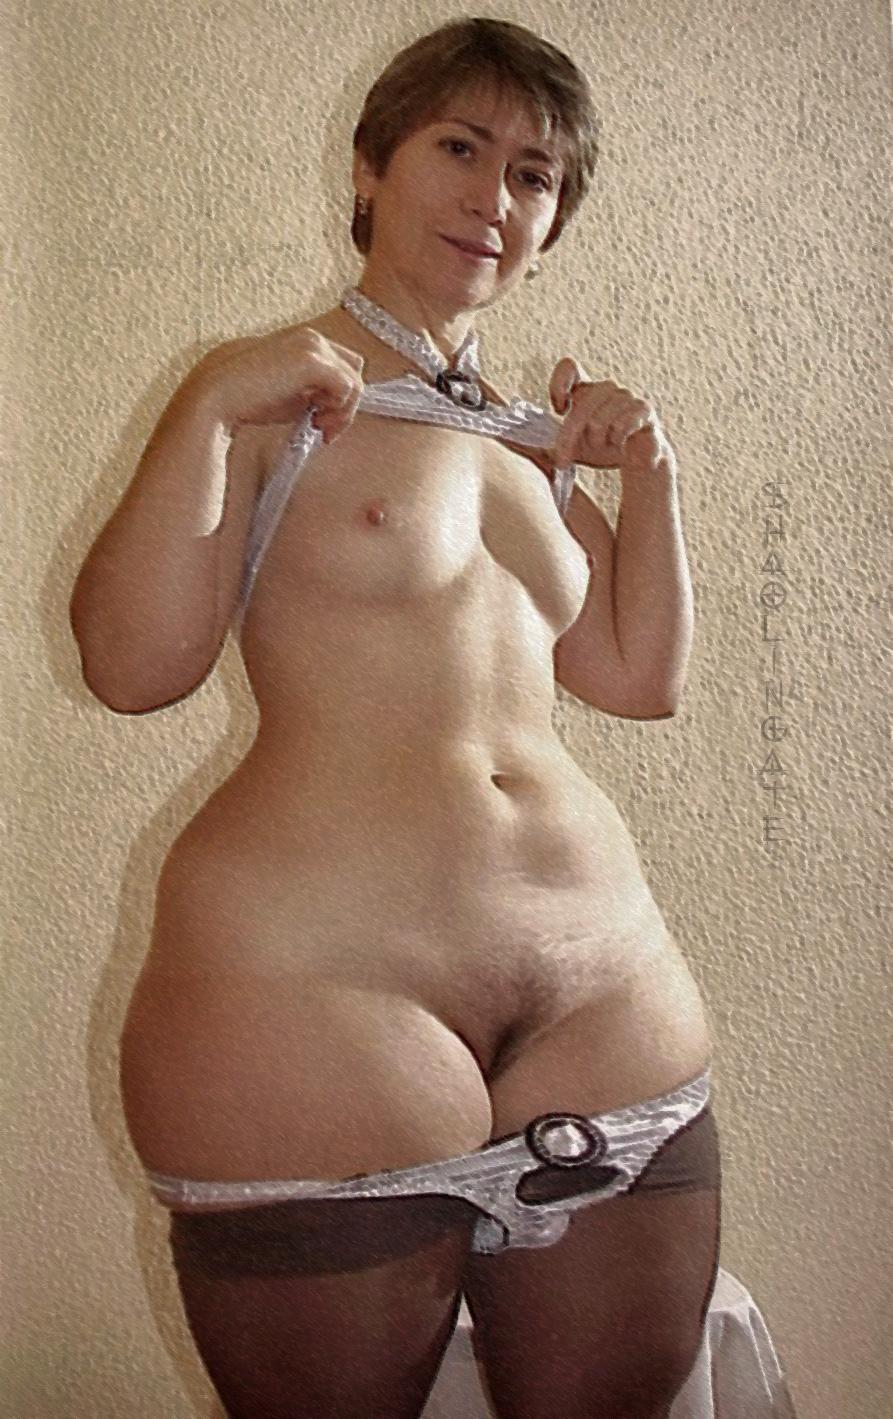 Lock S. reccomend Wide big butt mature women